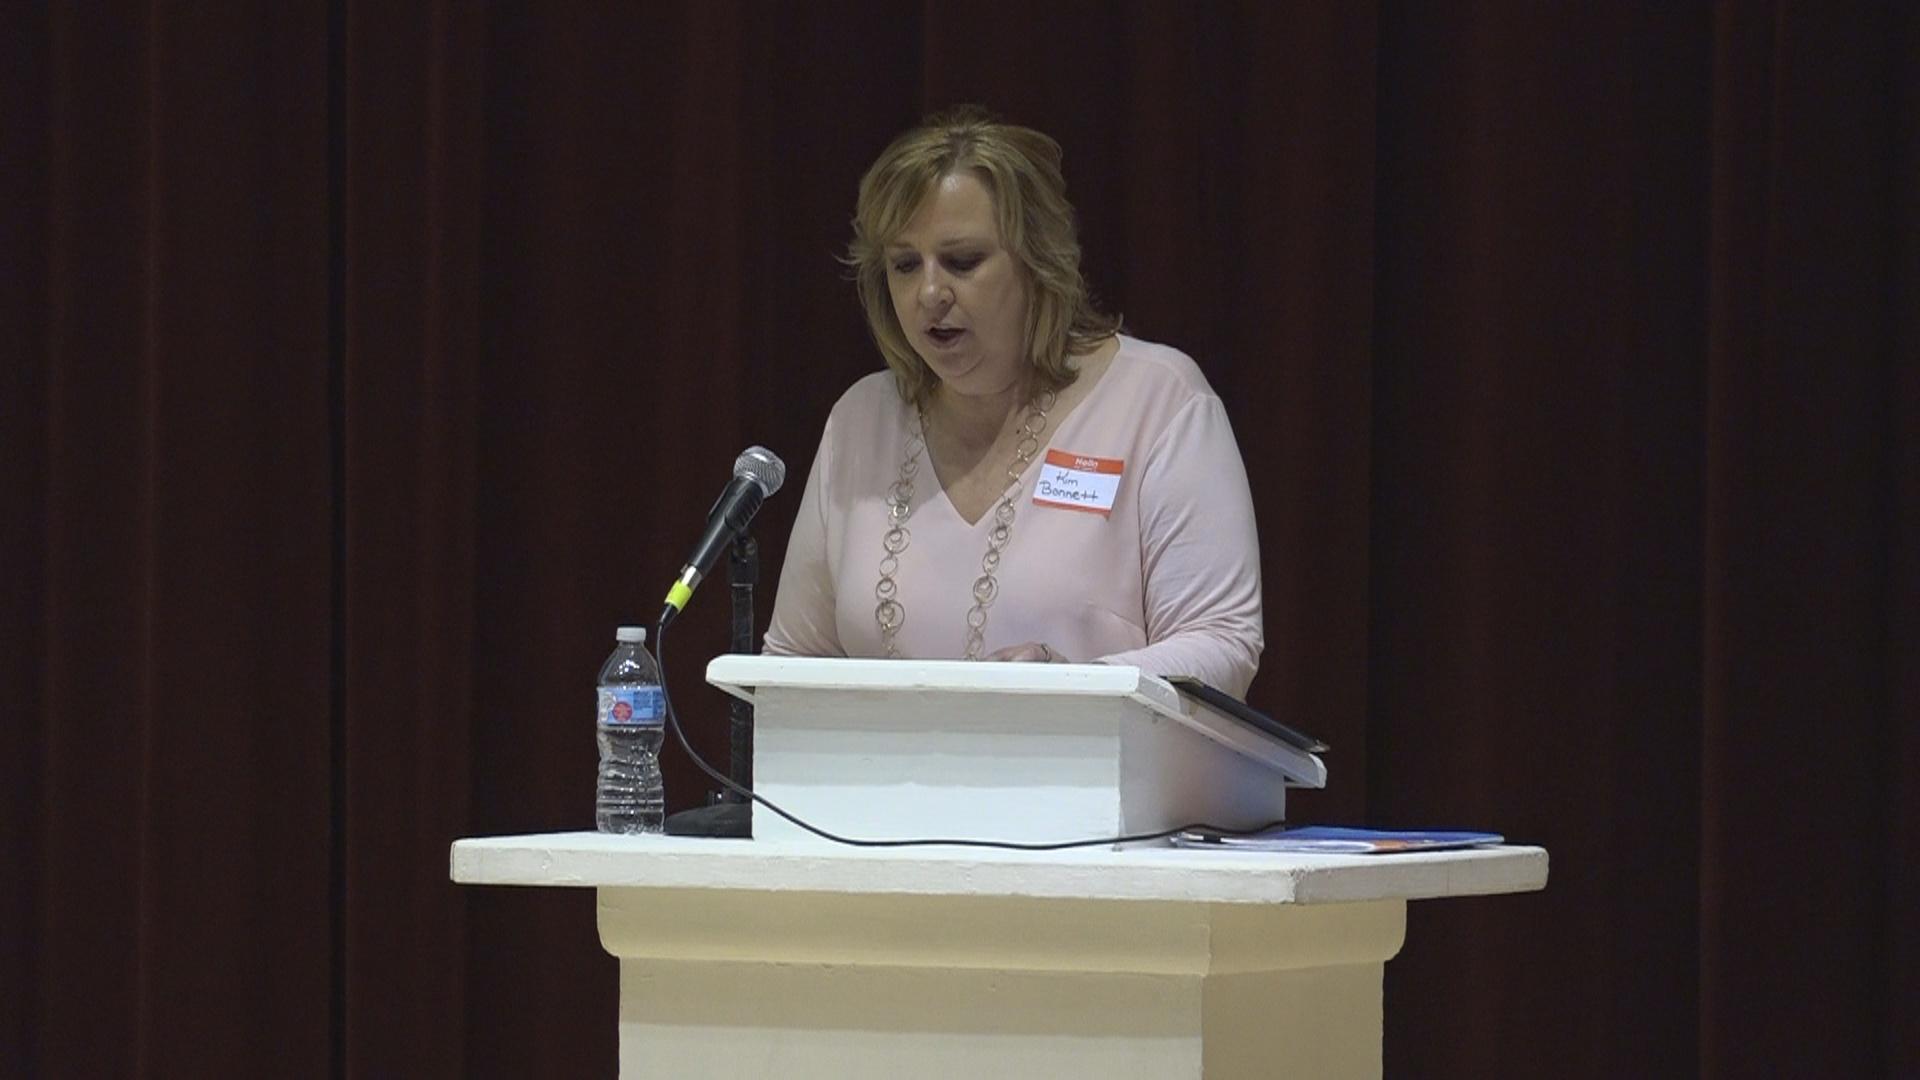 Lewis County Education Association hosts education forum